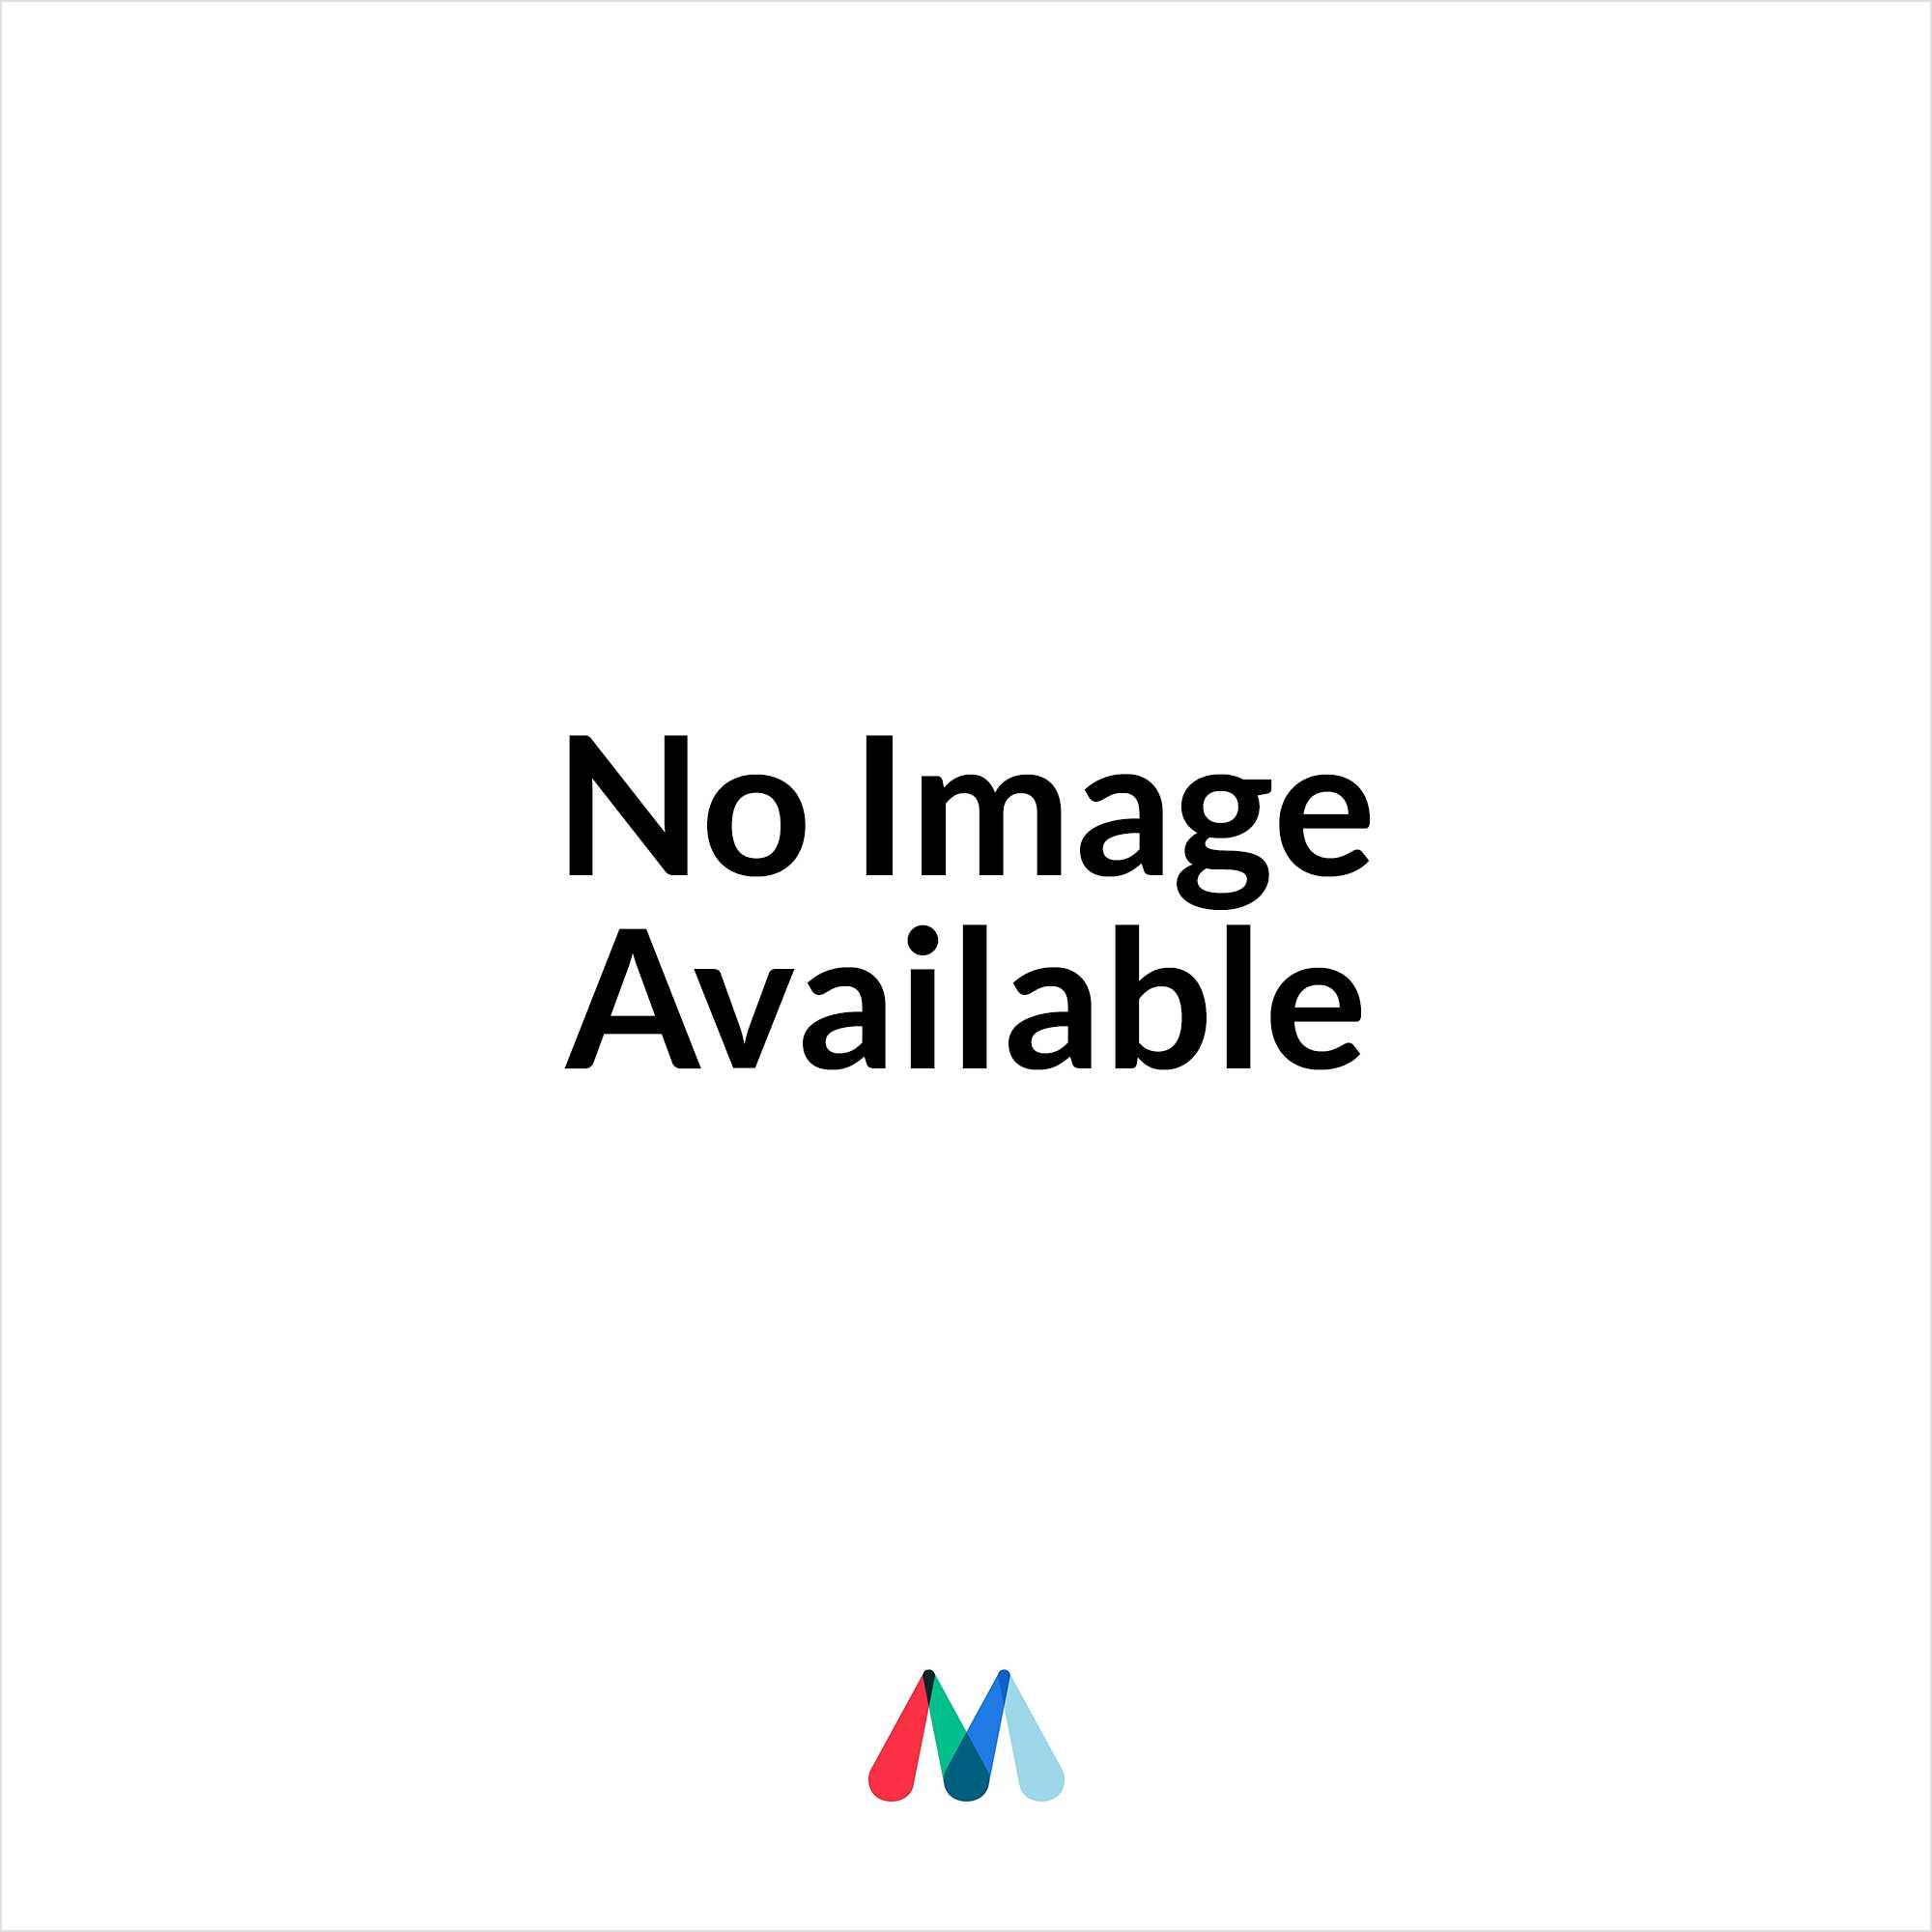 FIBRE LED LIGHT NW Fibre Optic Light Injector - Low voltage